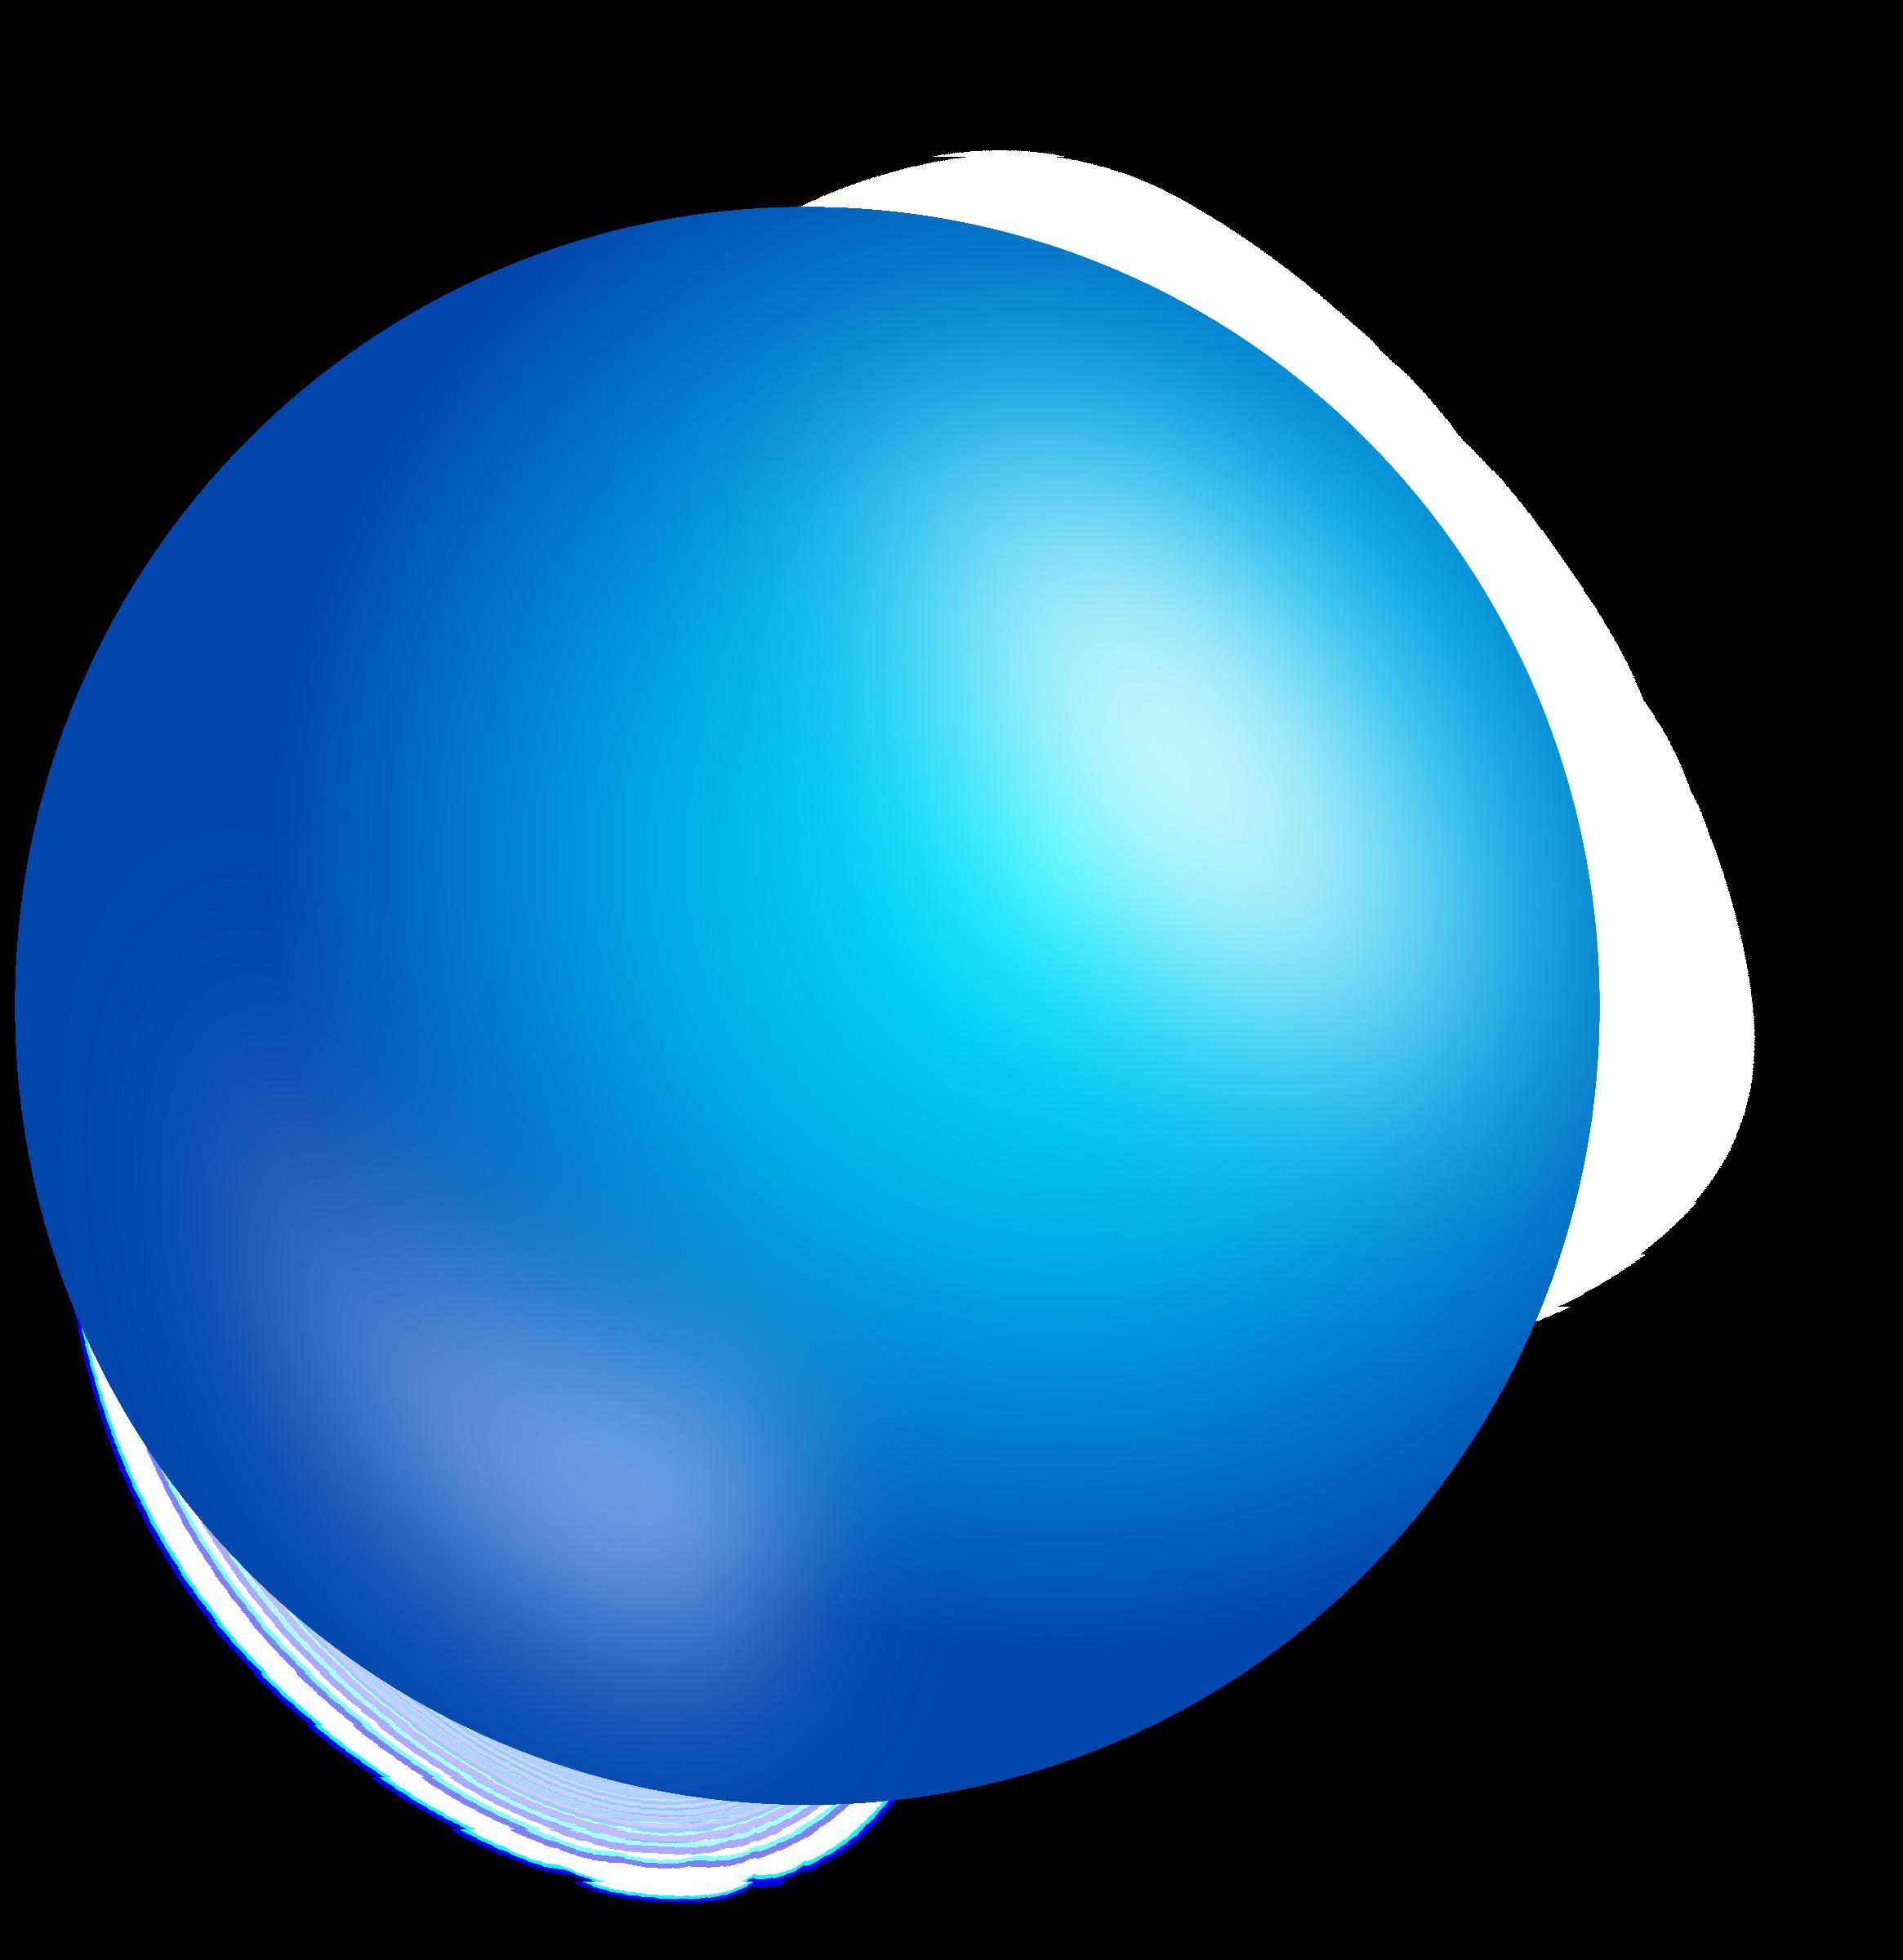 clip art download Blue clip art transprent. Ball transparent sphere